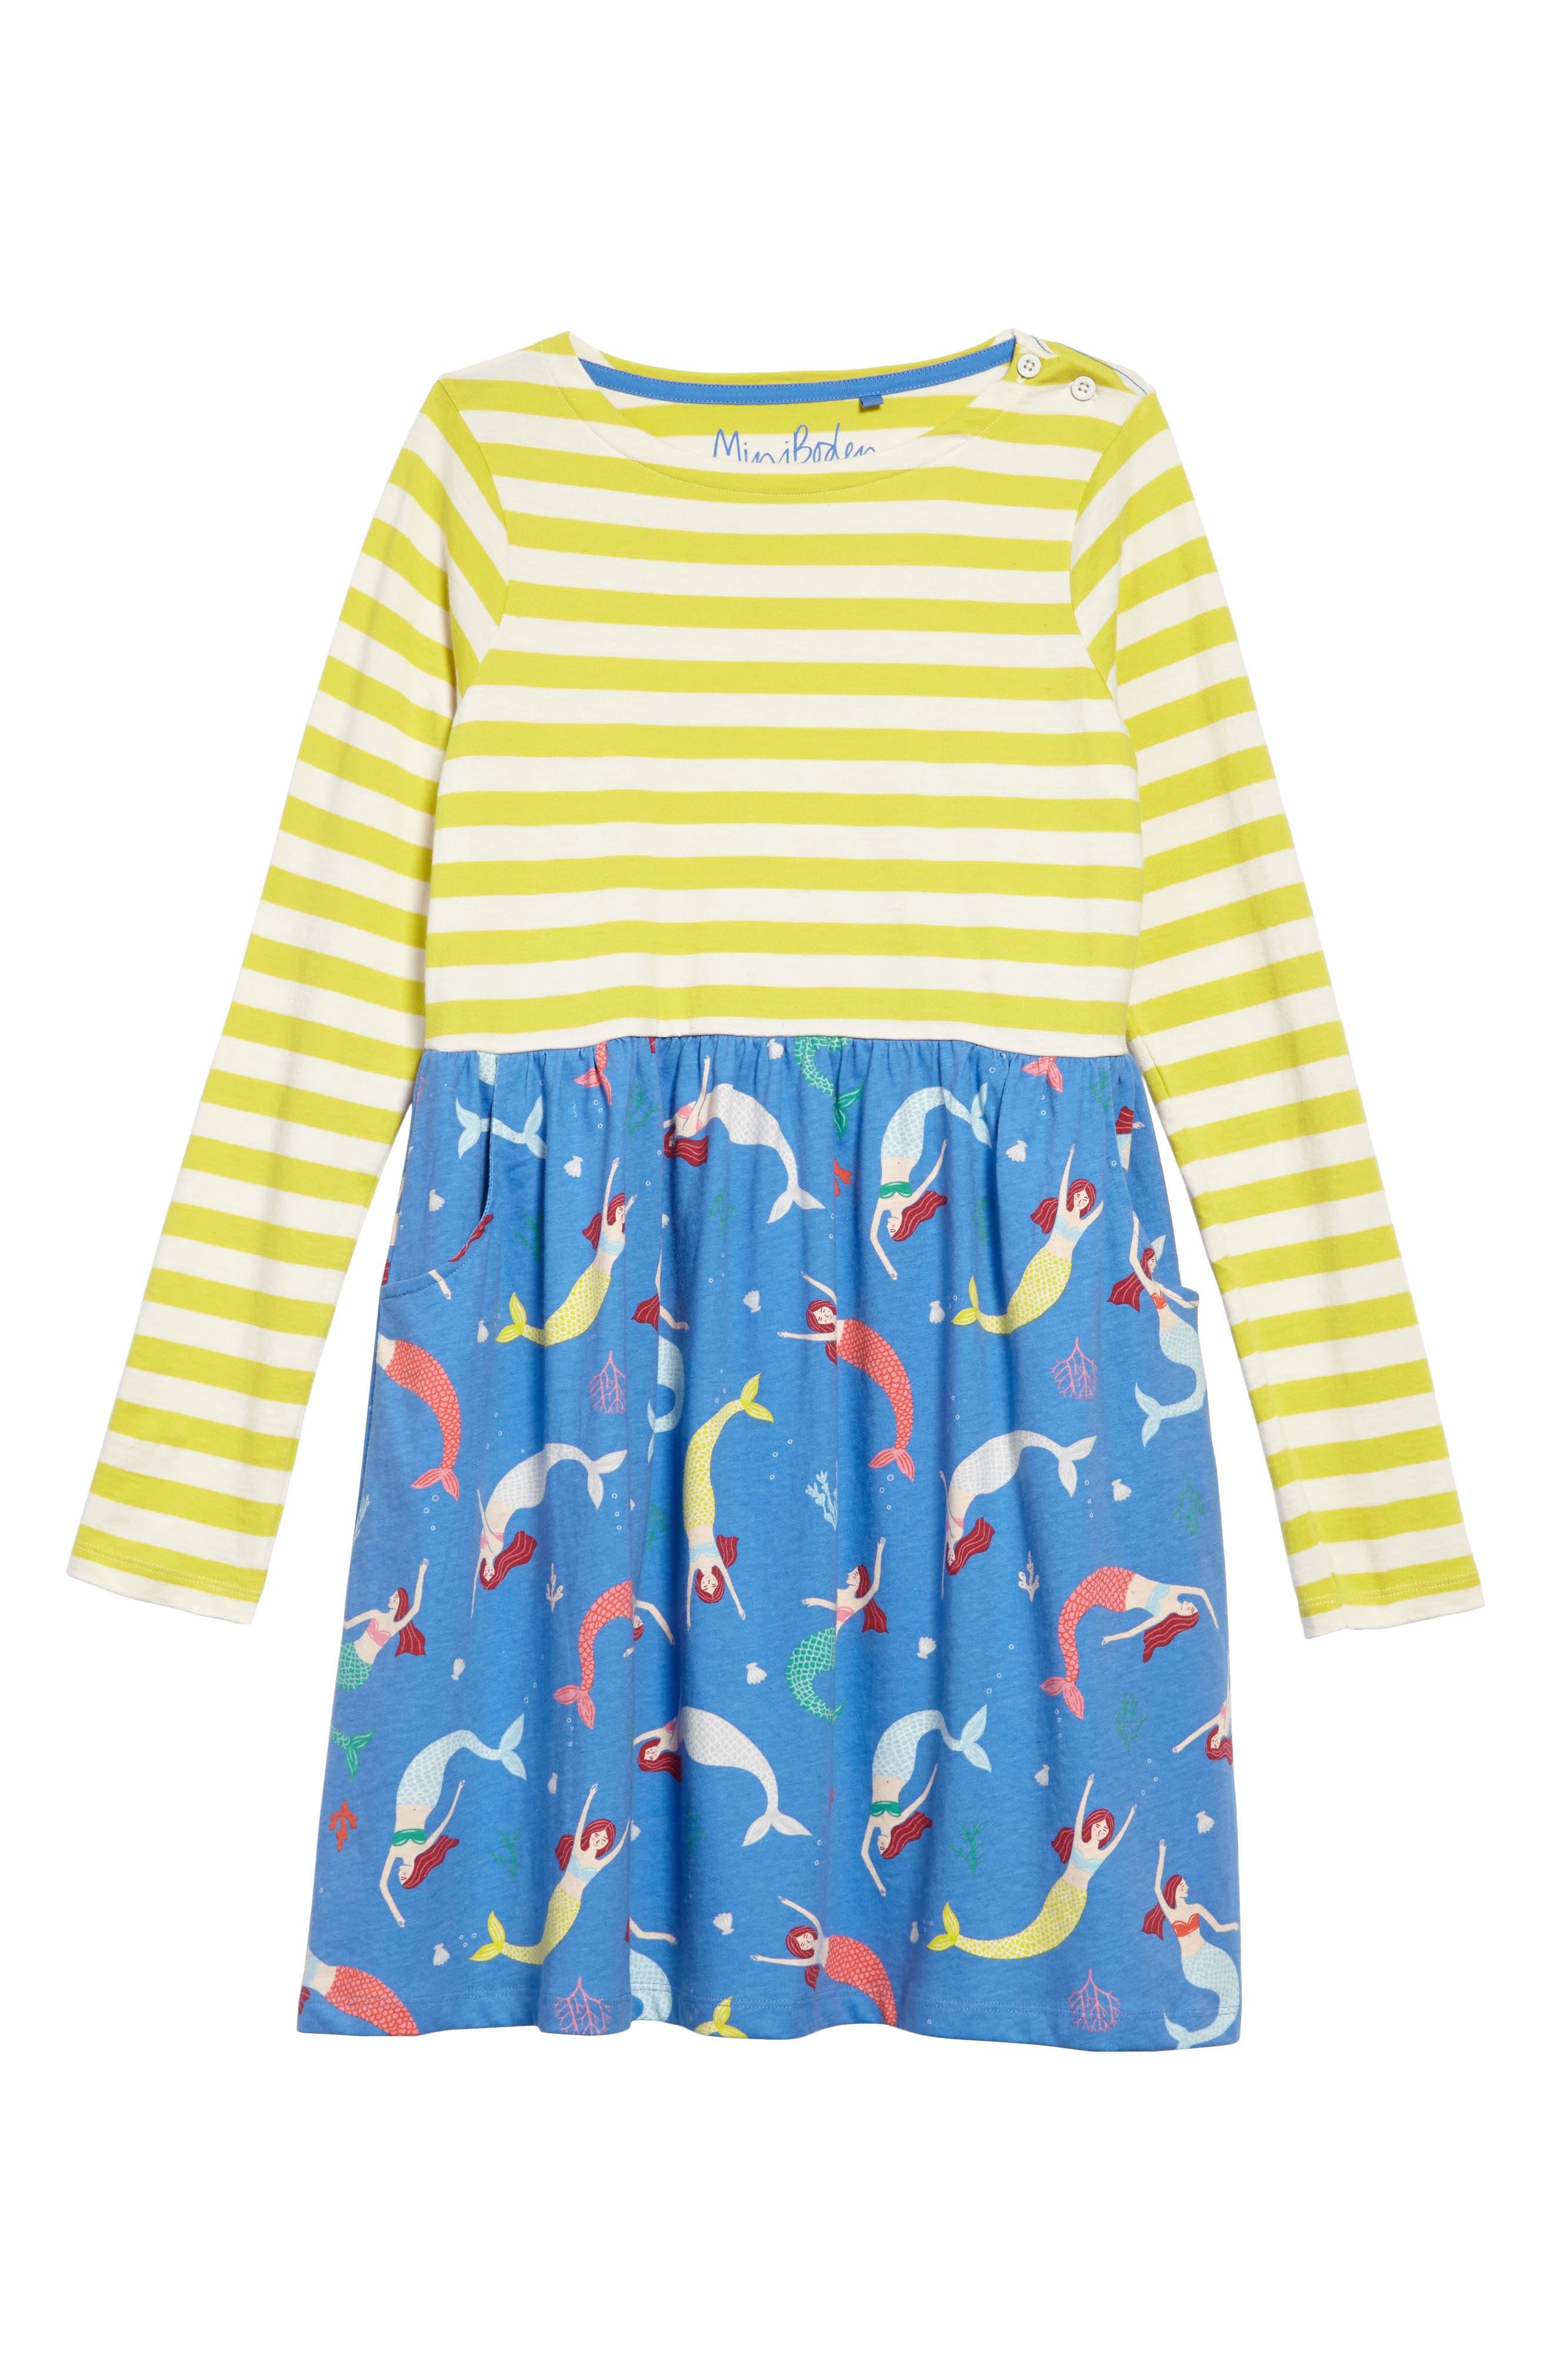 Hotchpotch Jersey Dress,                             Main thumbnail 1, color,                             Penzance Blue Mermaid